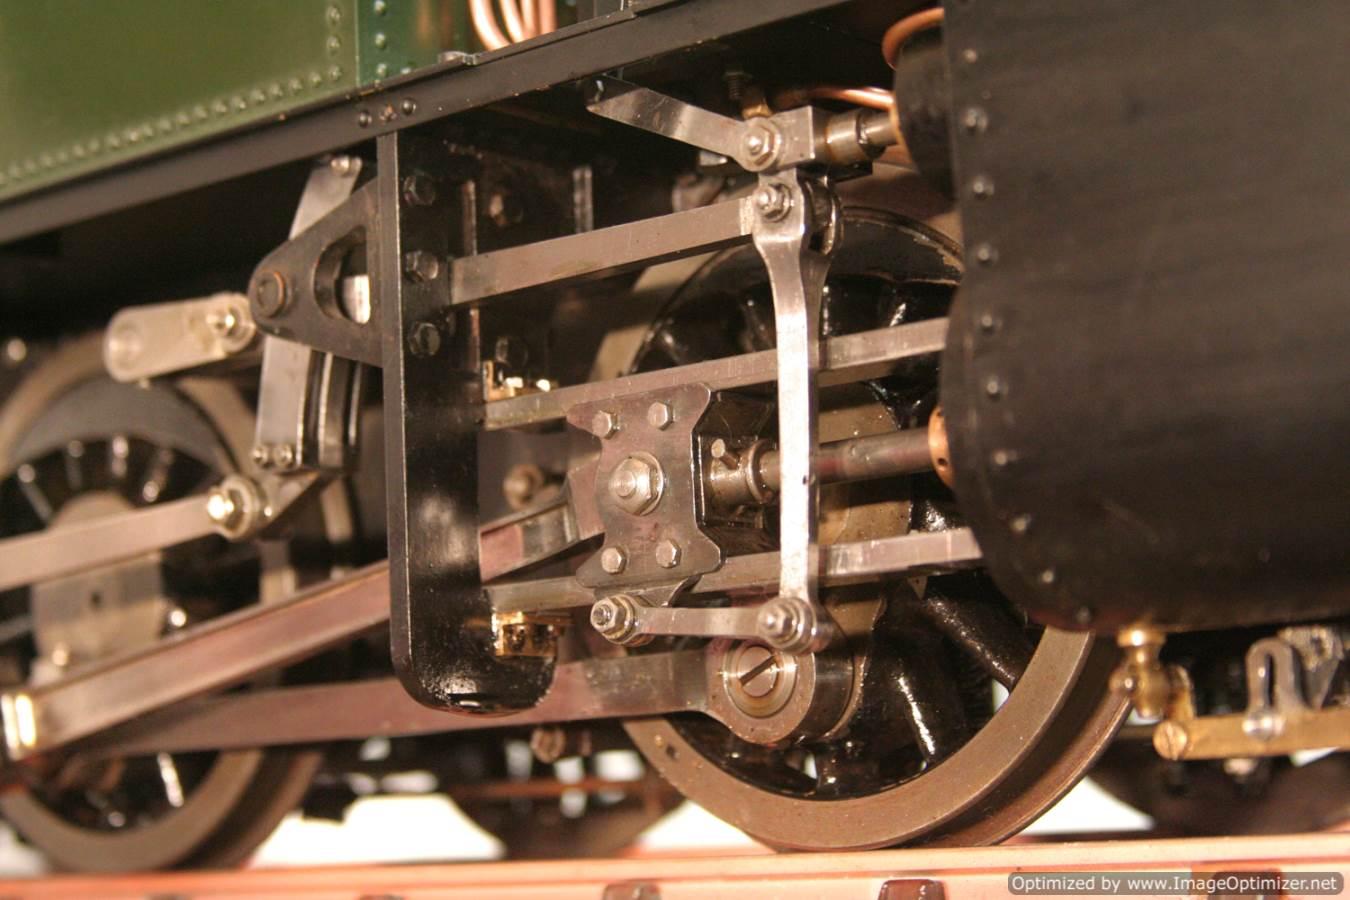 test simplex live steam locomotive for sale 06 Optimized